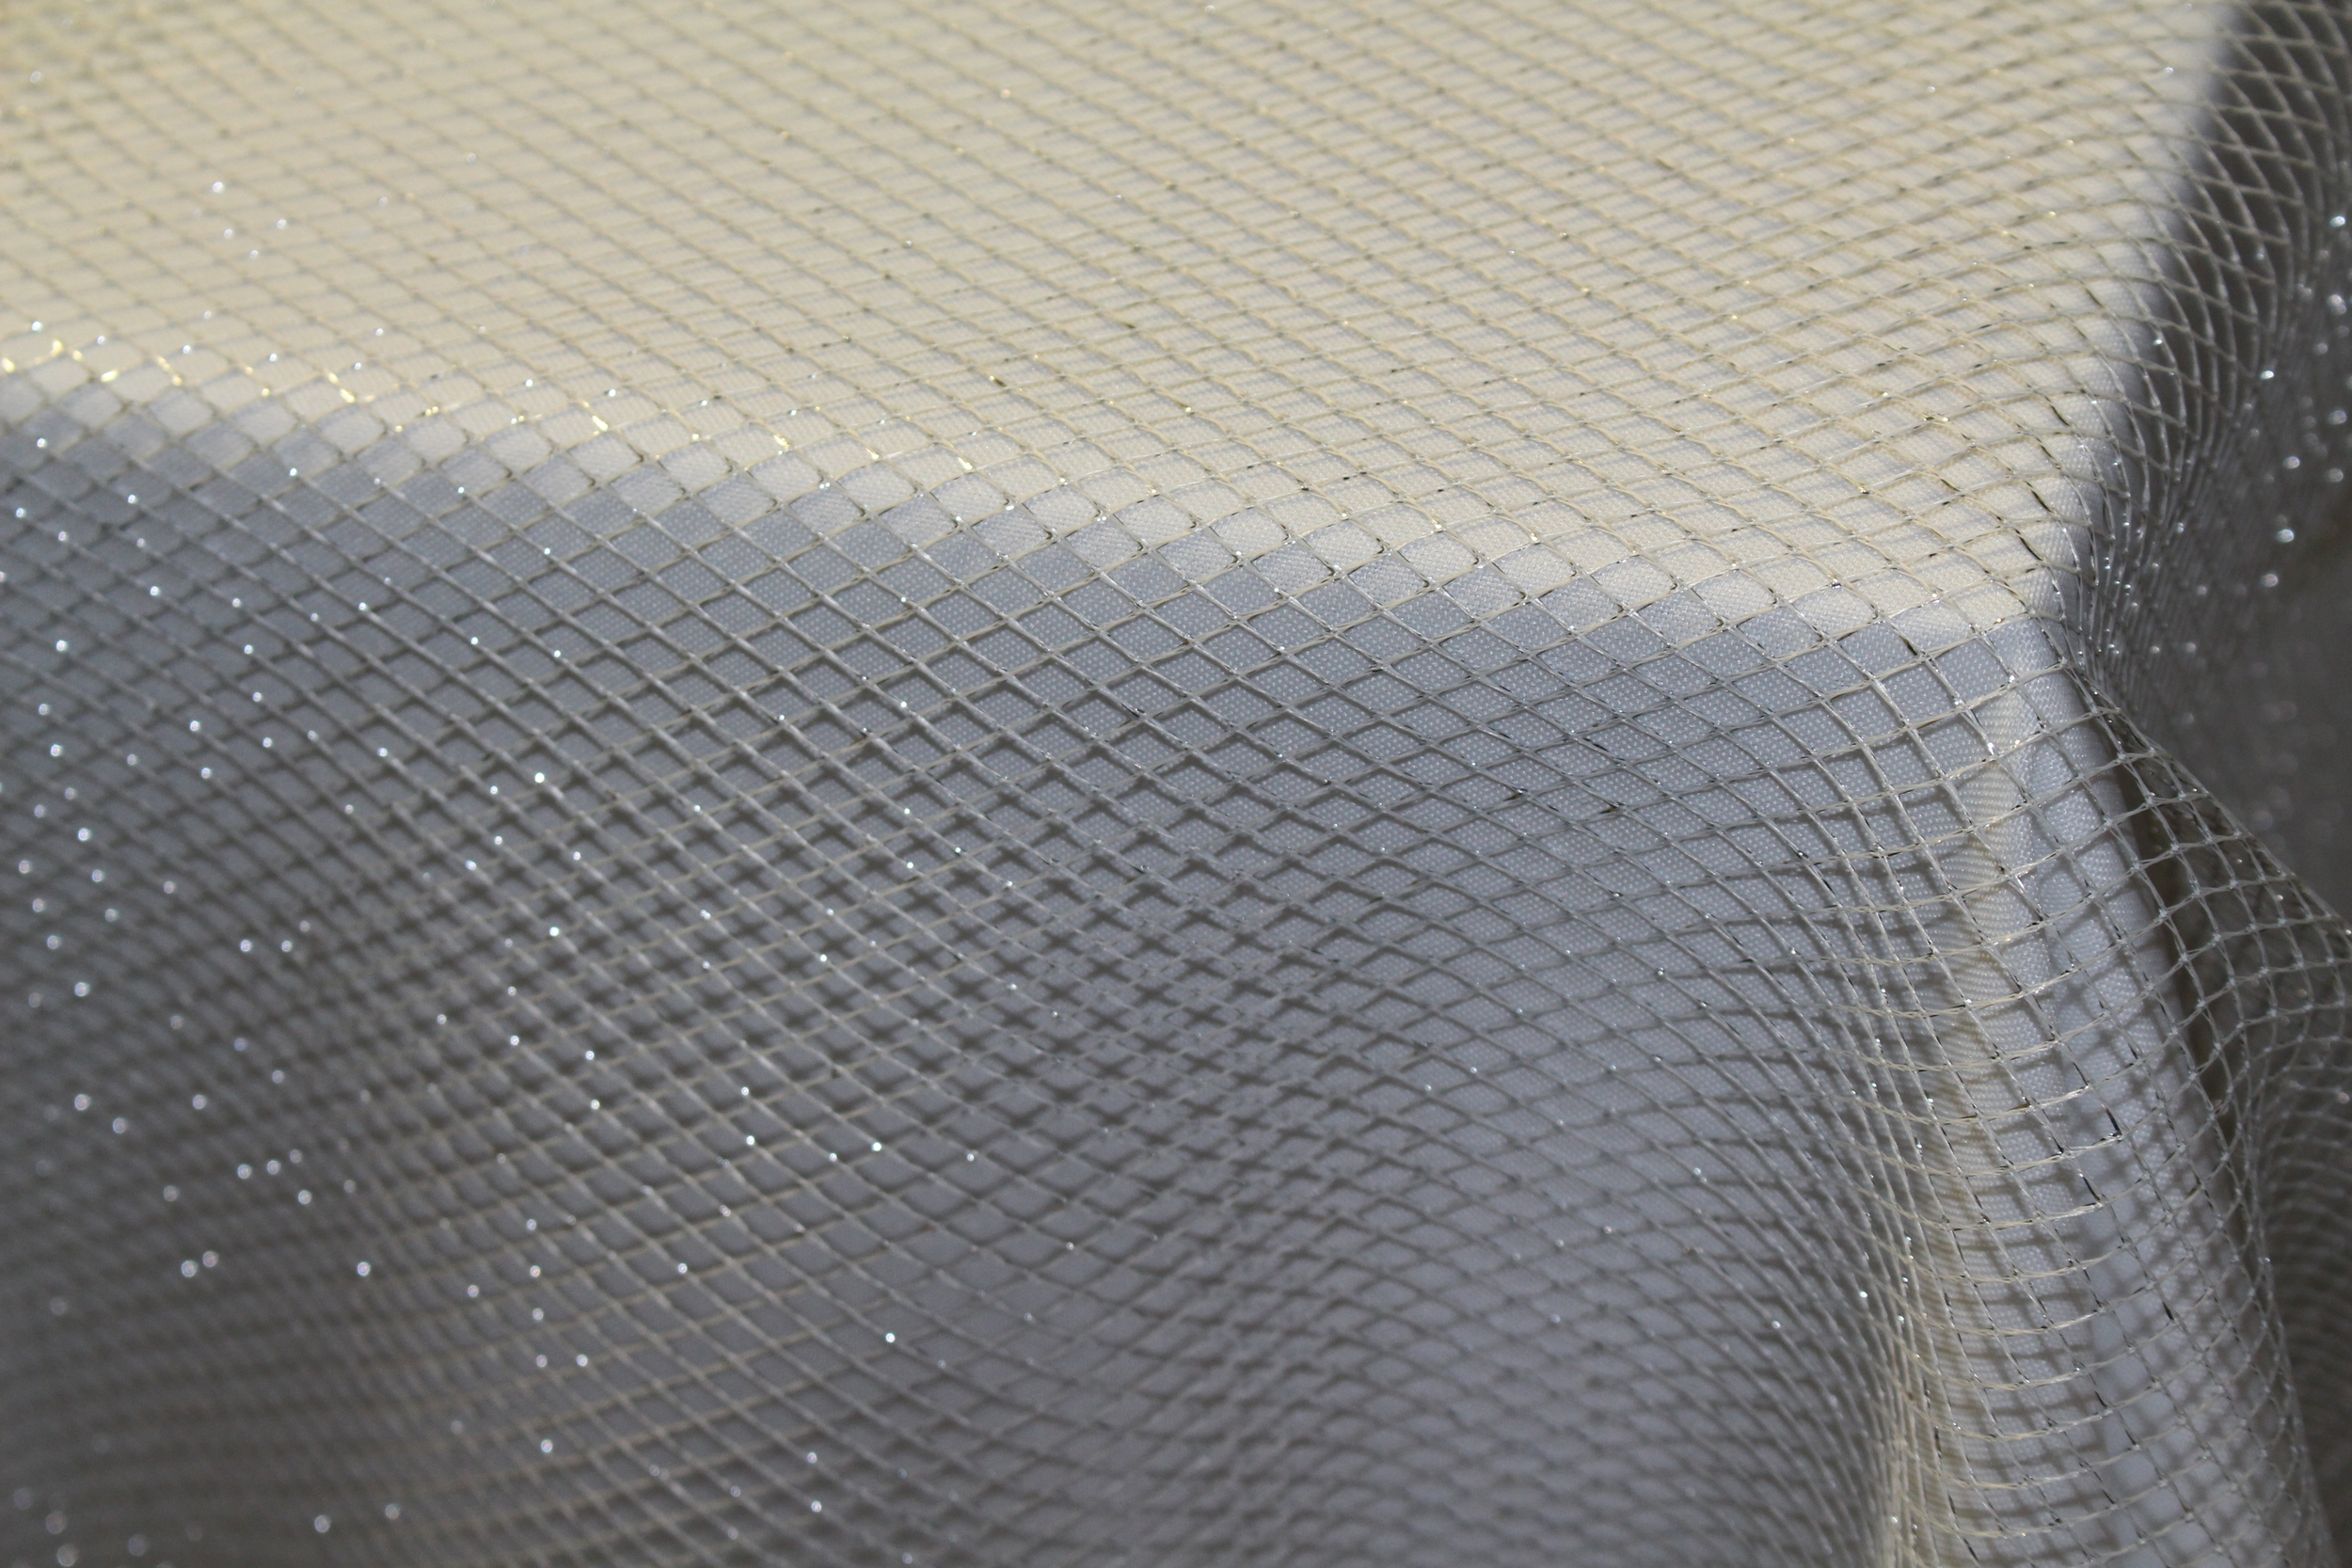 Silver Net Overlay